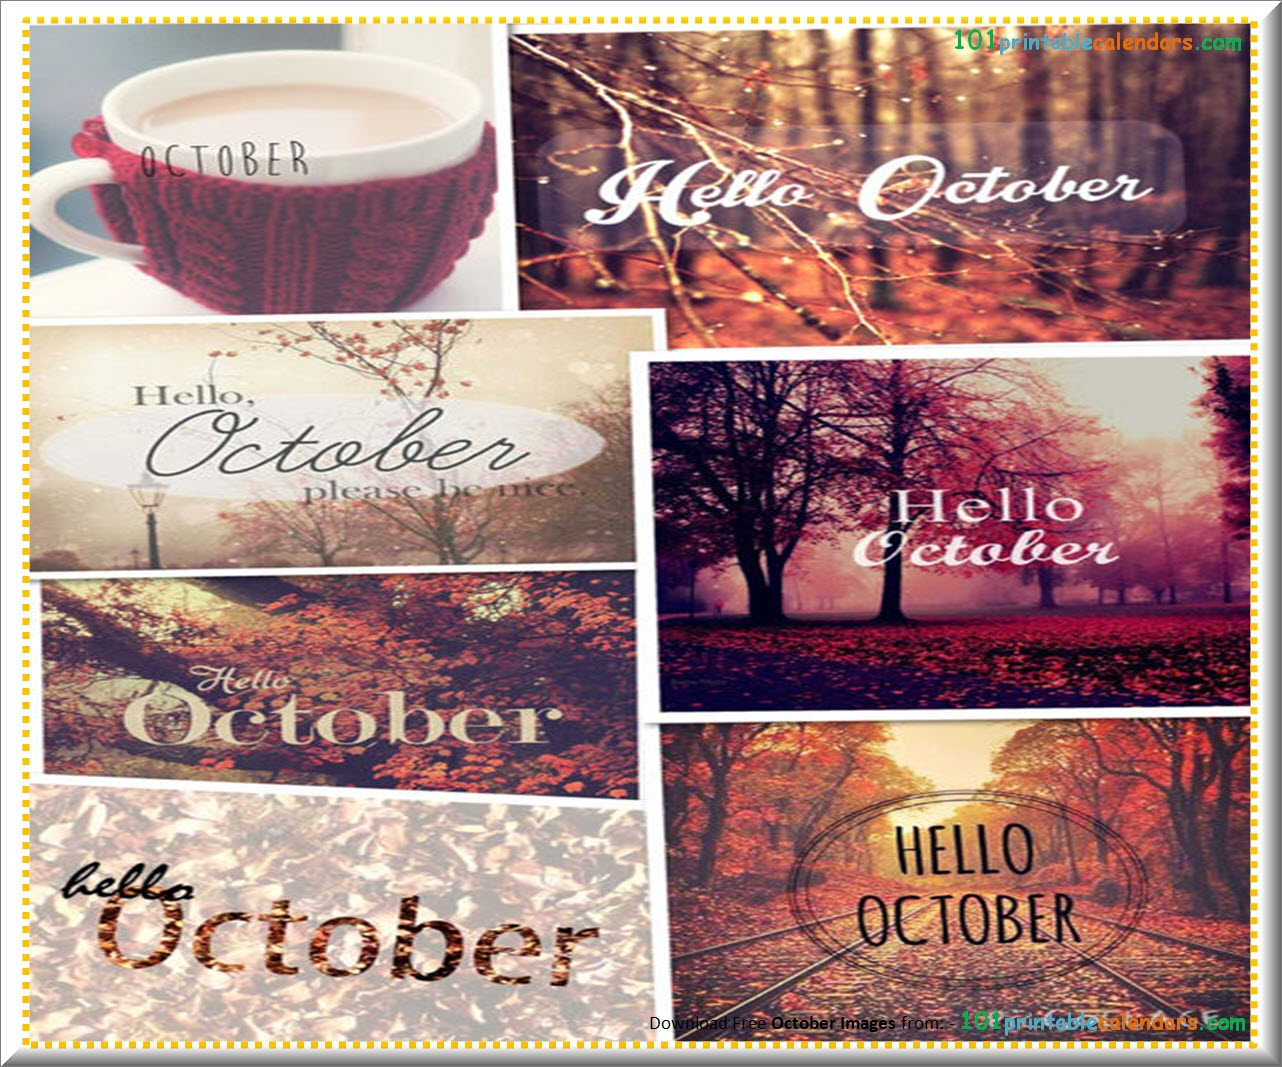 Hello October Month Tumblr Pinterst Instagram Facebook